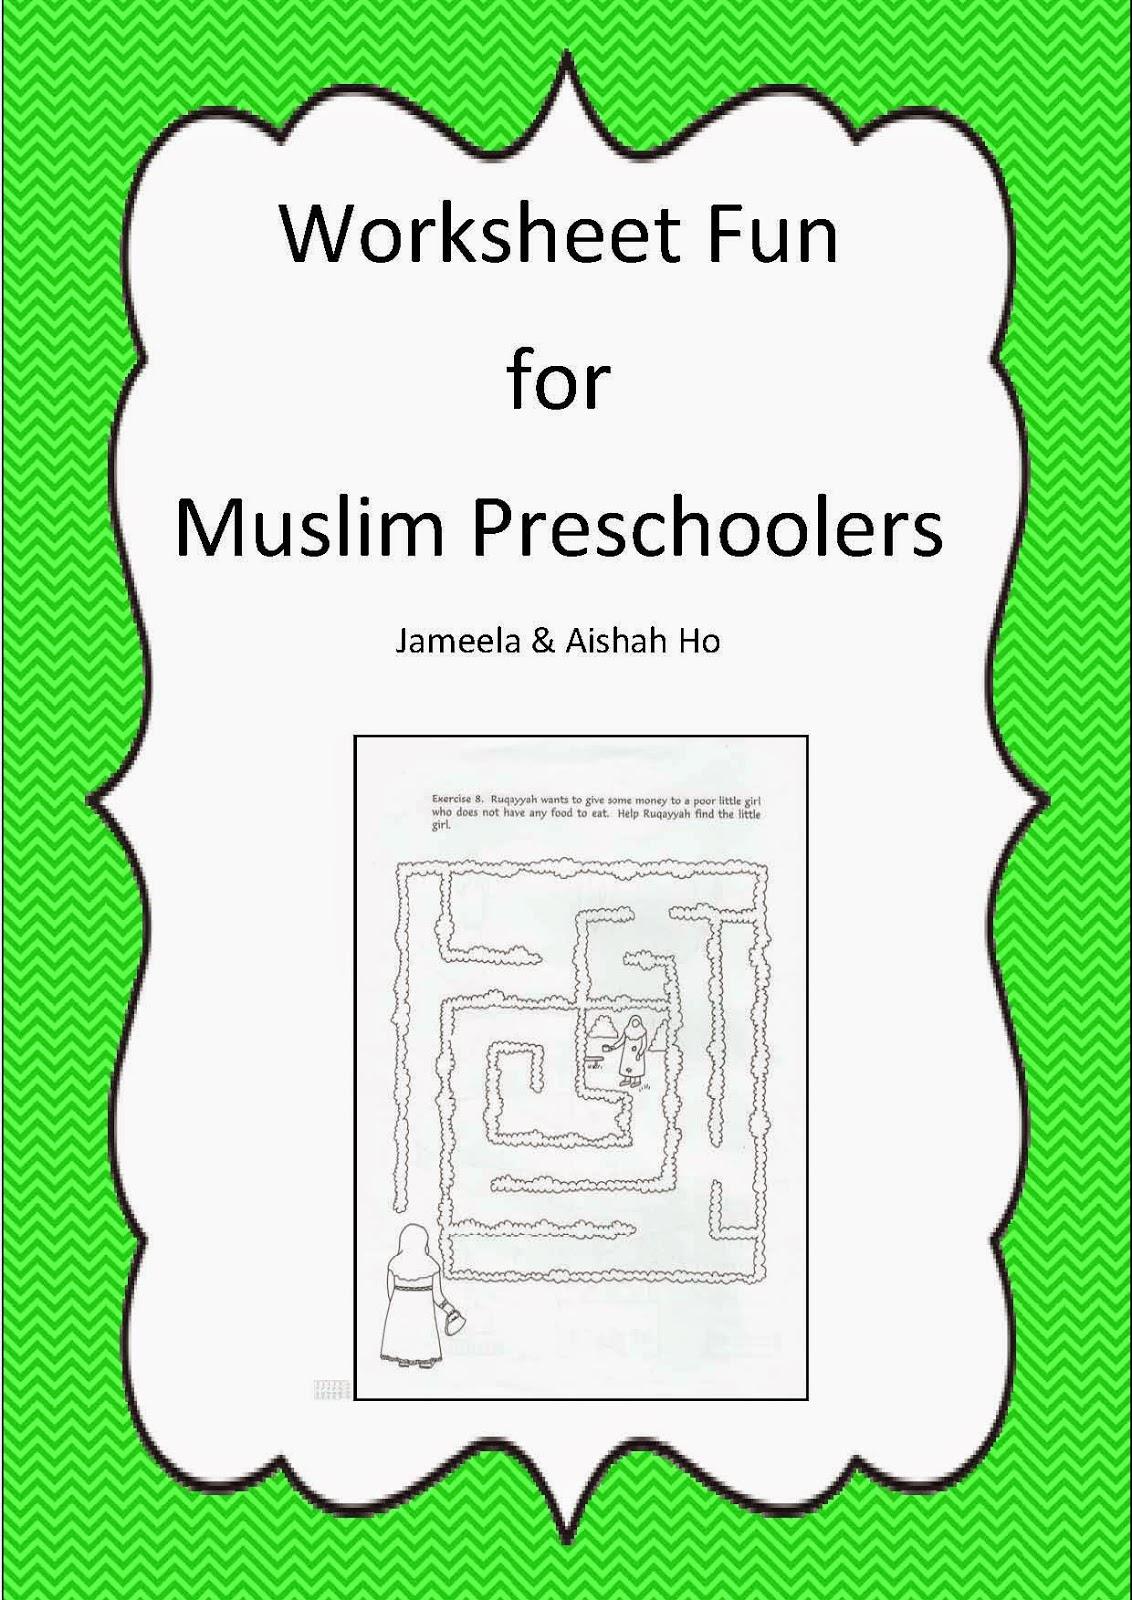 - ILMA Education: Free Download: Worksheet Fun For Muslim Preschoolers